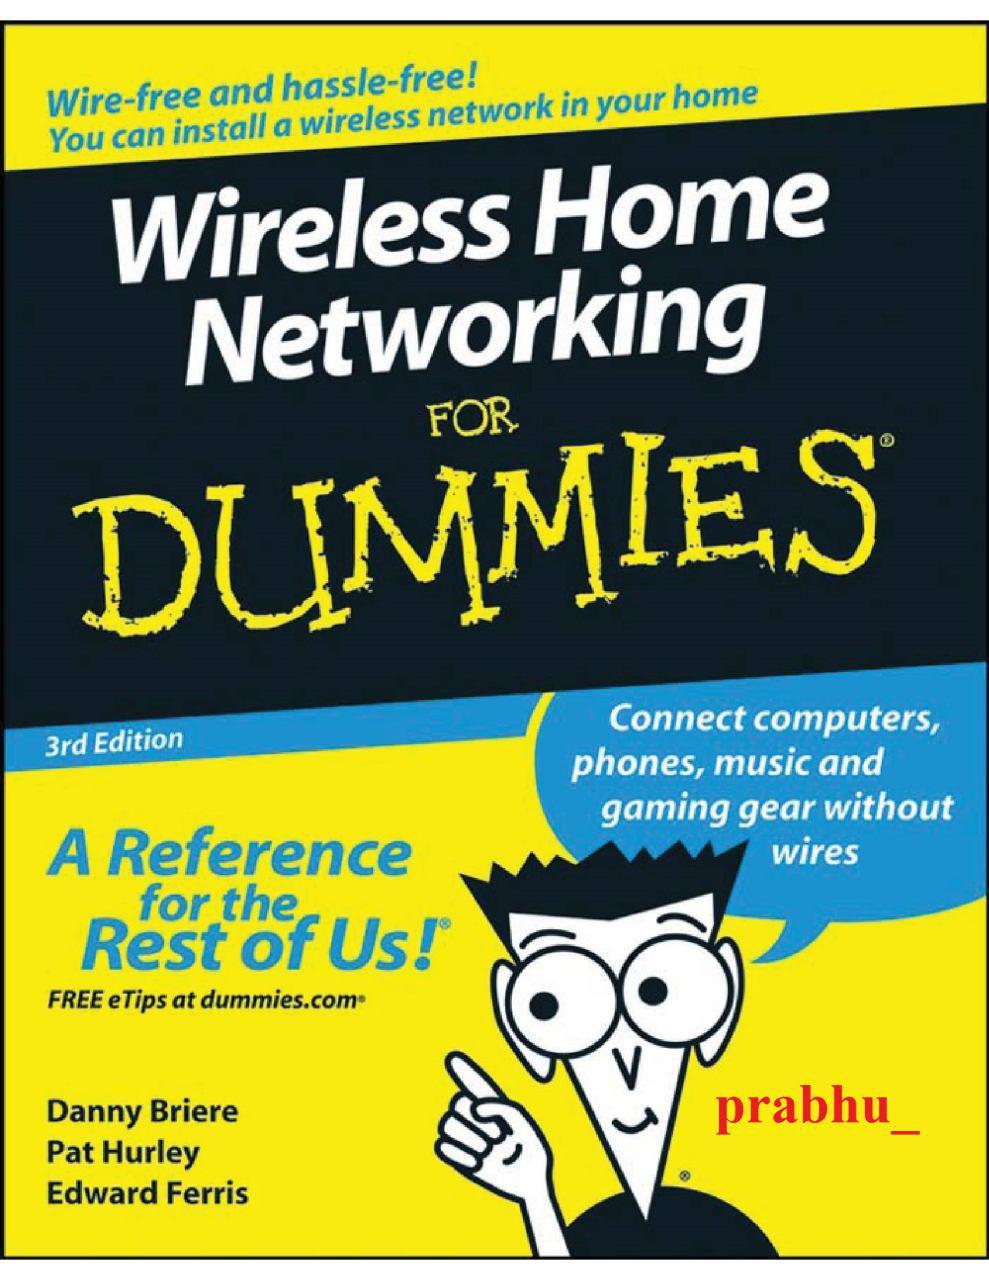 PDF رایگان کتاب Wireless Home Networking For Dum | دانلود کتاب Wireless Home Networking For Dum | دانلود رایگان پی دی اف Wireless Home Networking For Dum